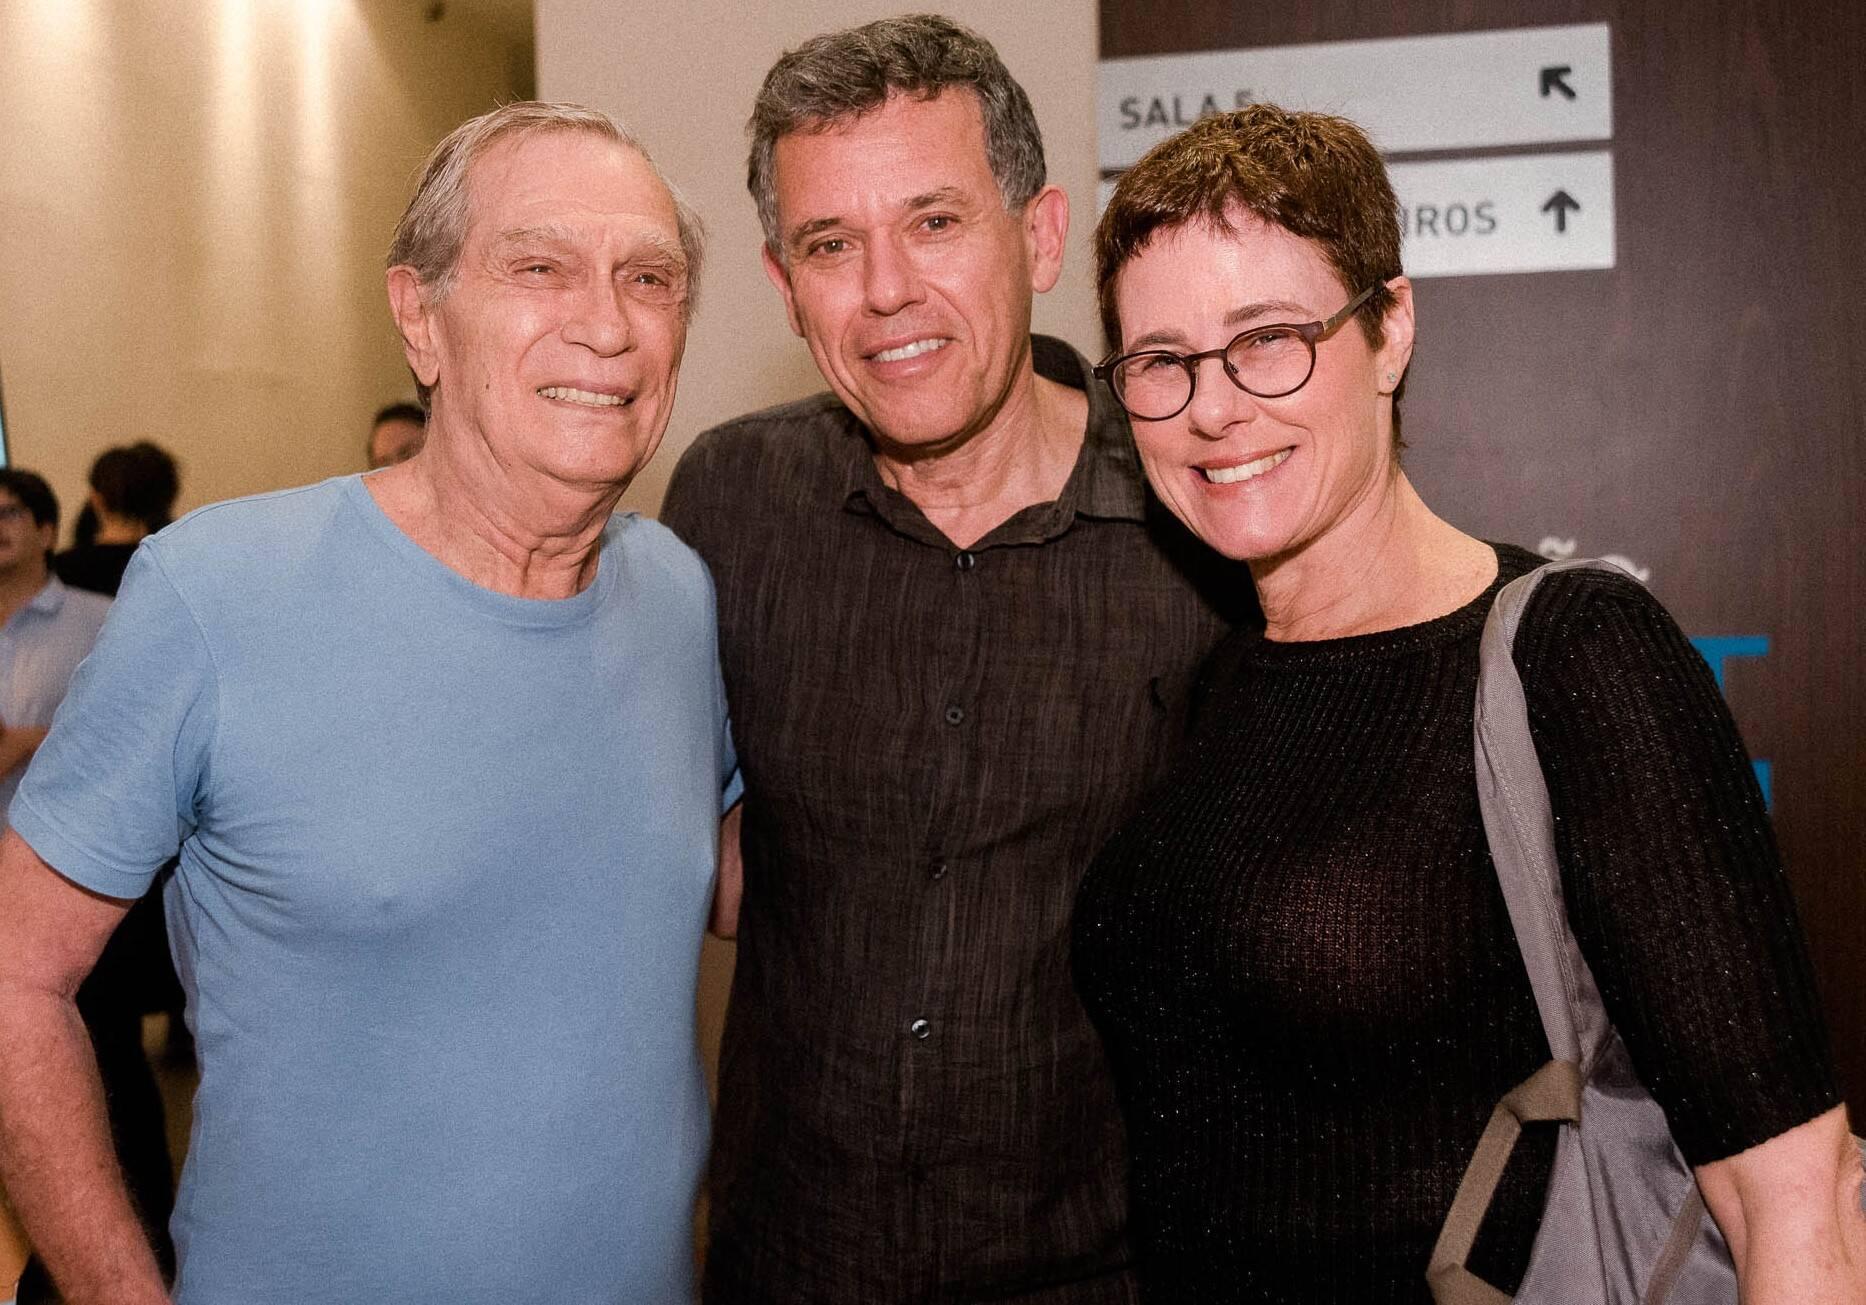 Jorge Mautner, Nilton Bonder e Esther Bonder /Foto: Renato Wrobel